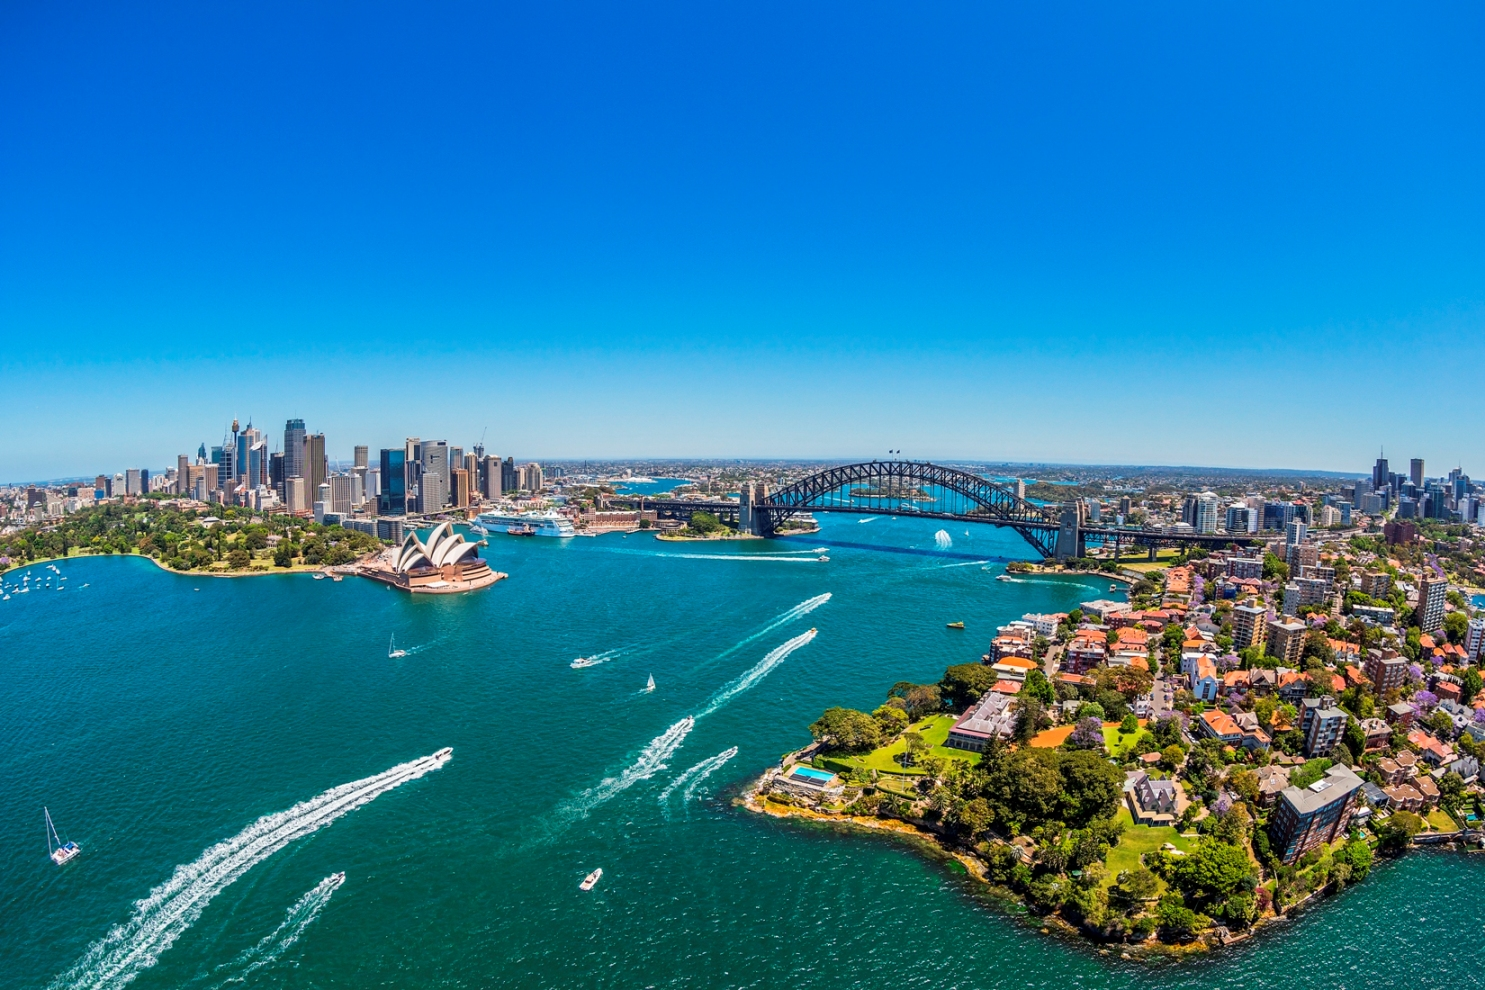 #Sydney #Australia